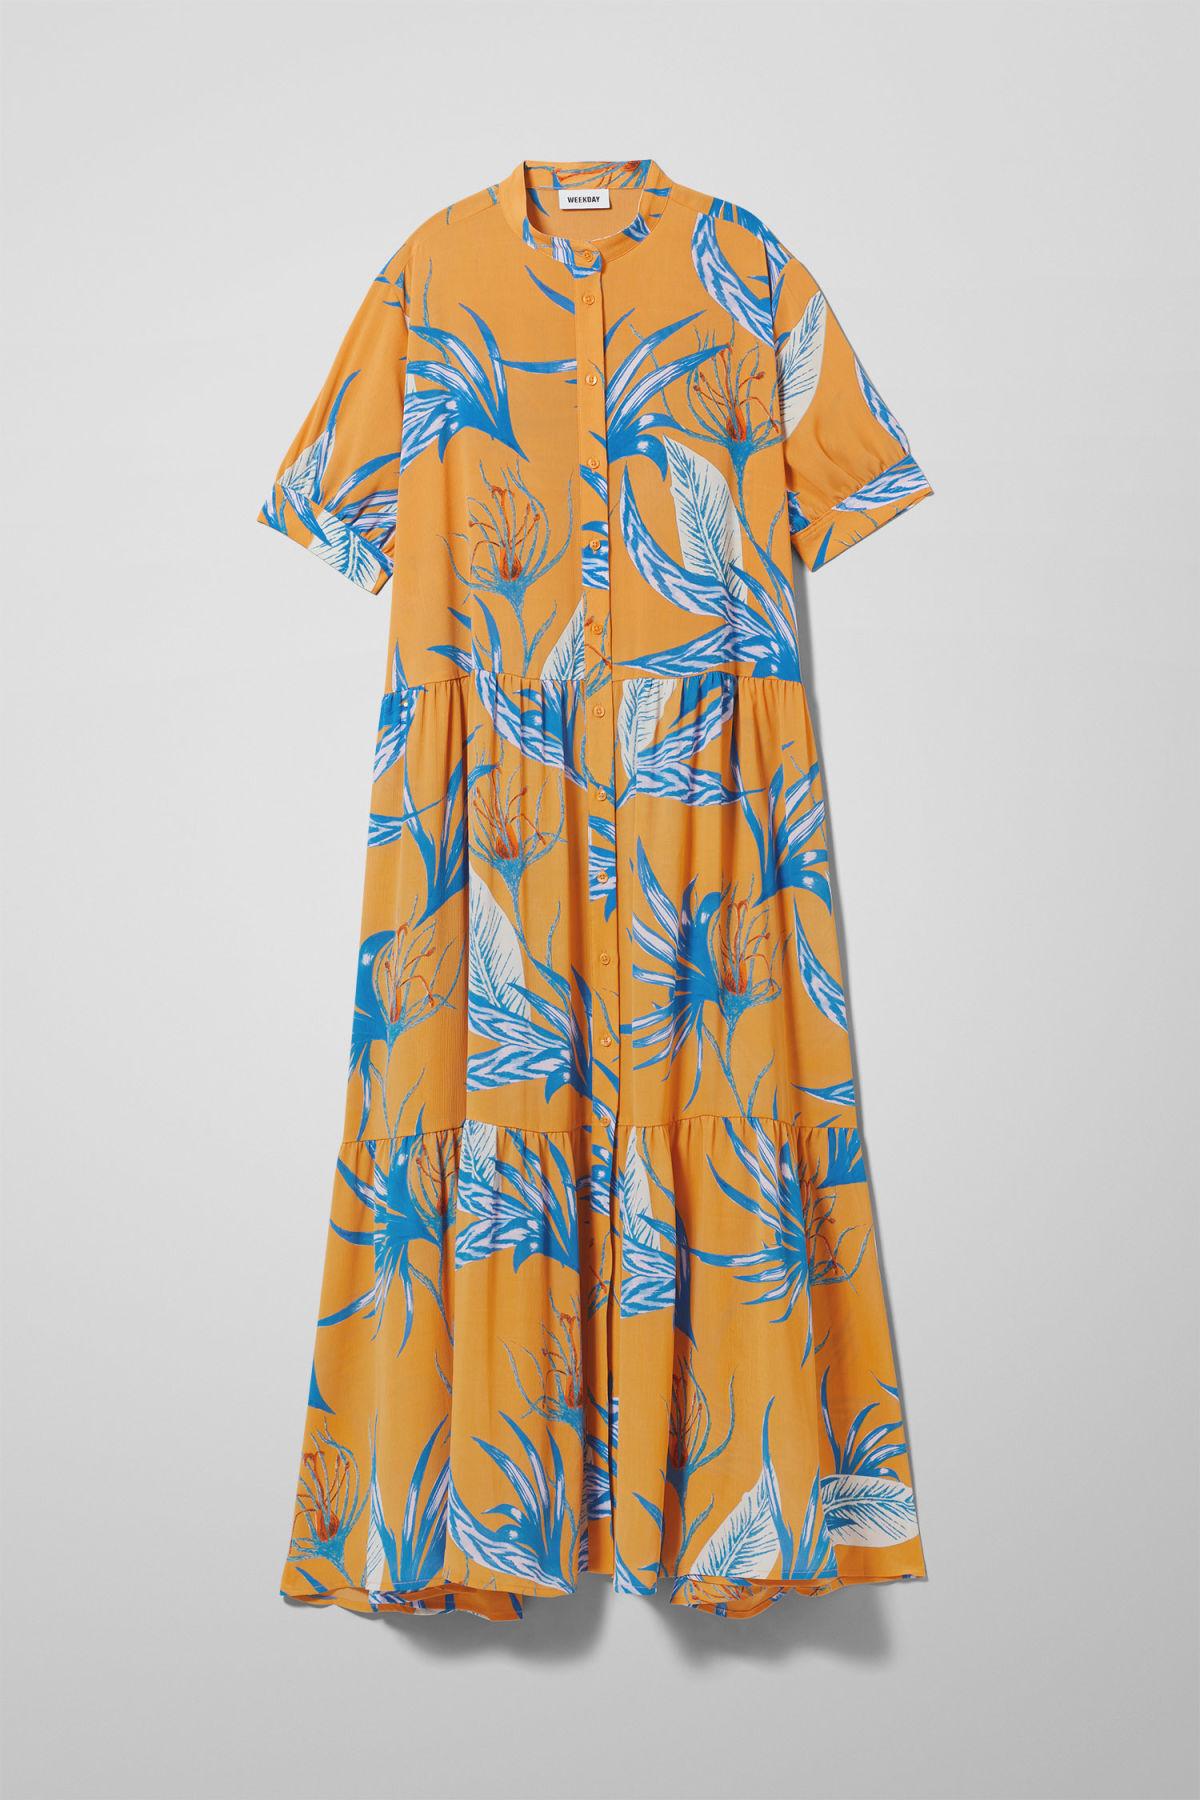 Image of Storm Dress - Yellow-M